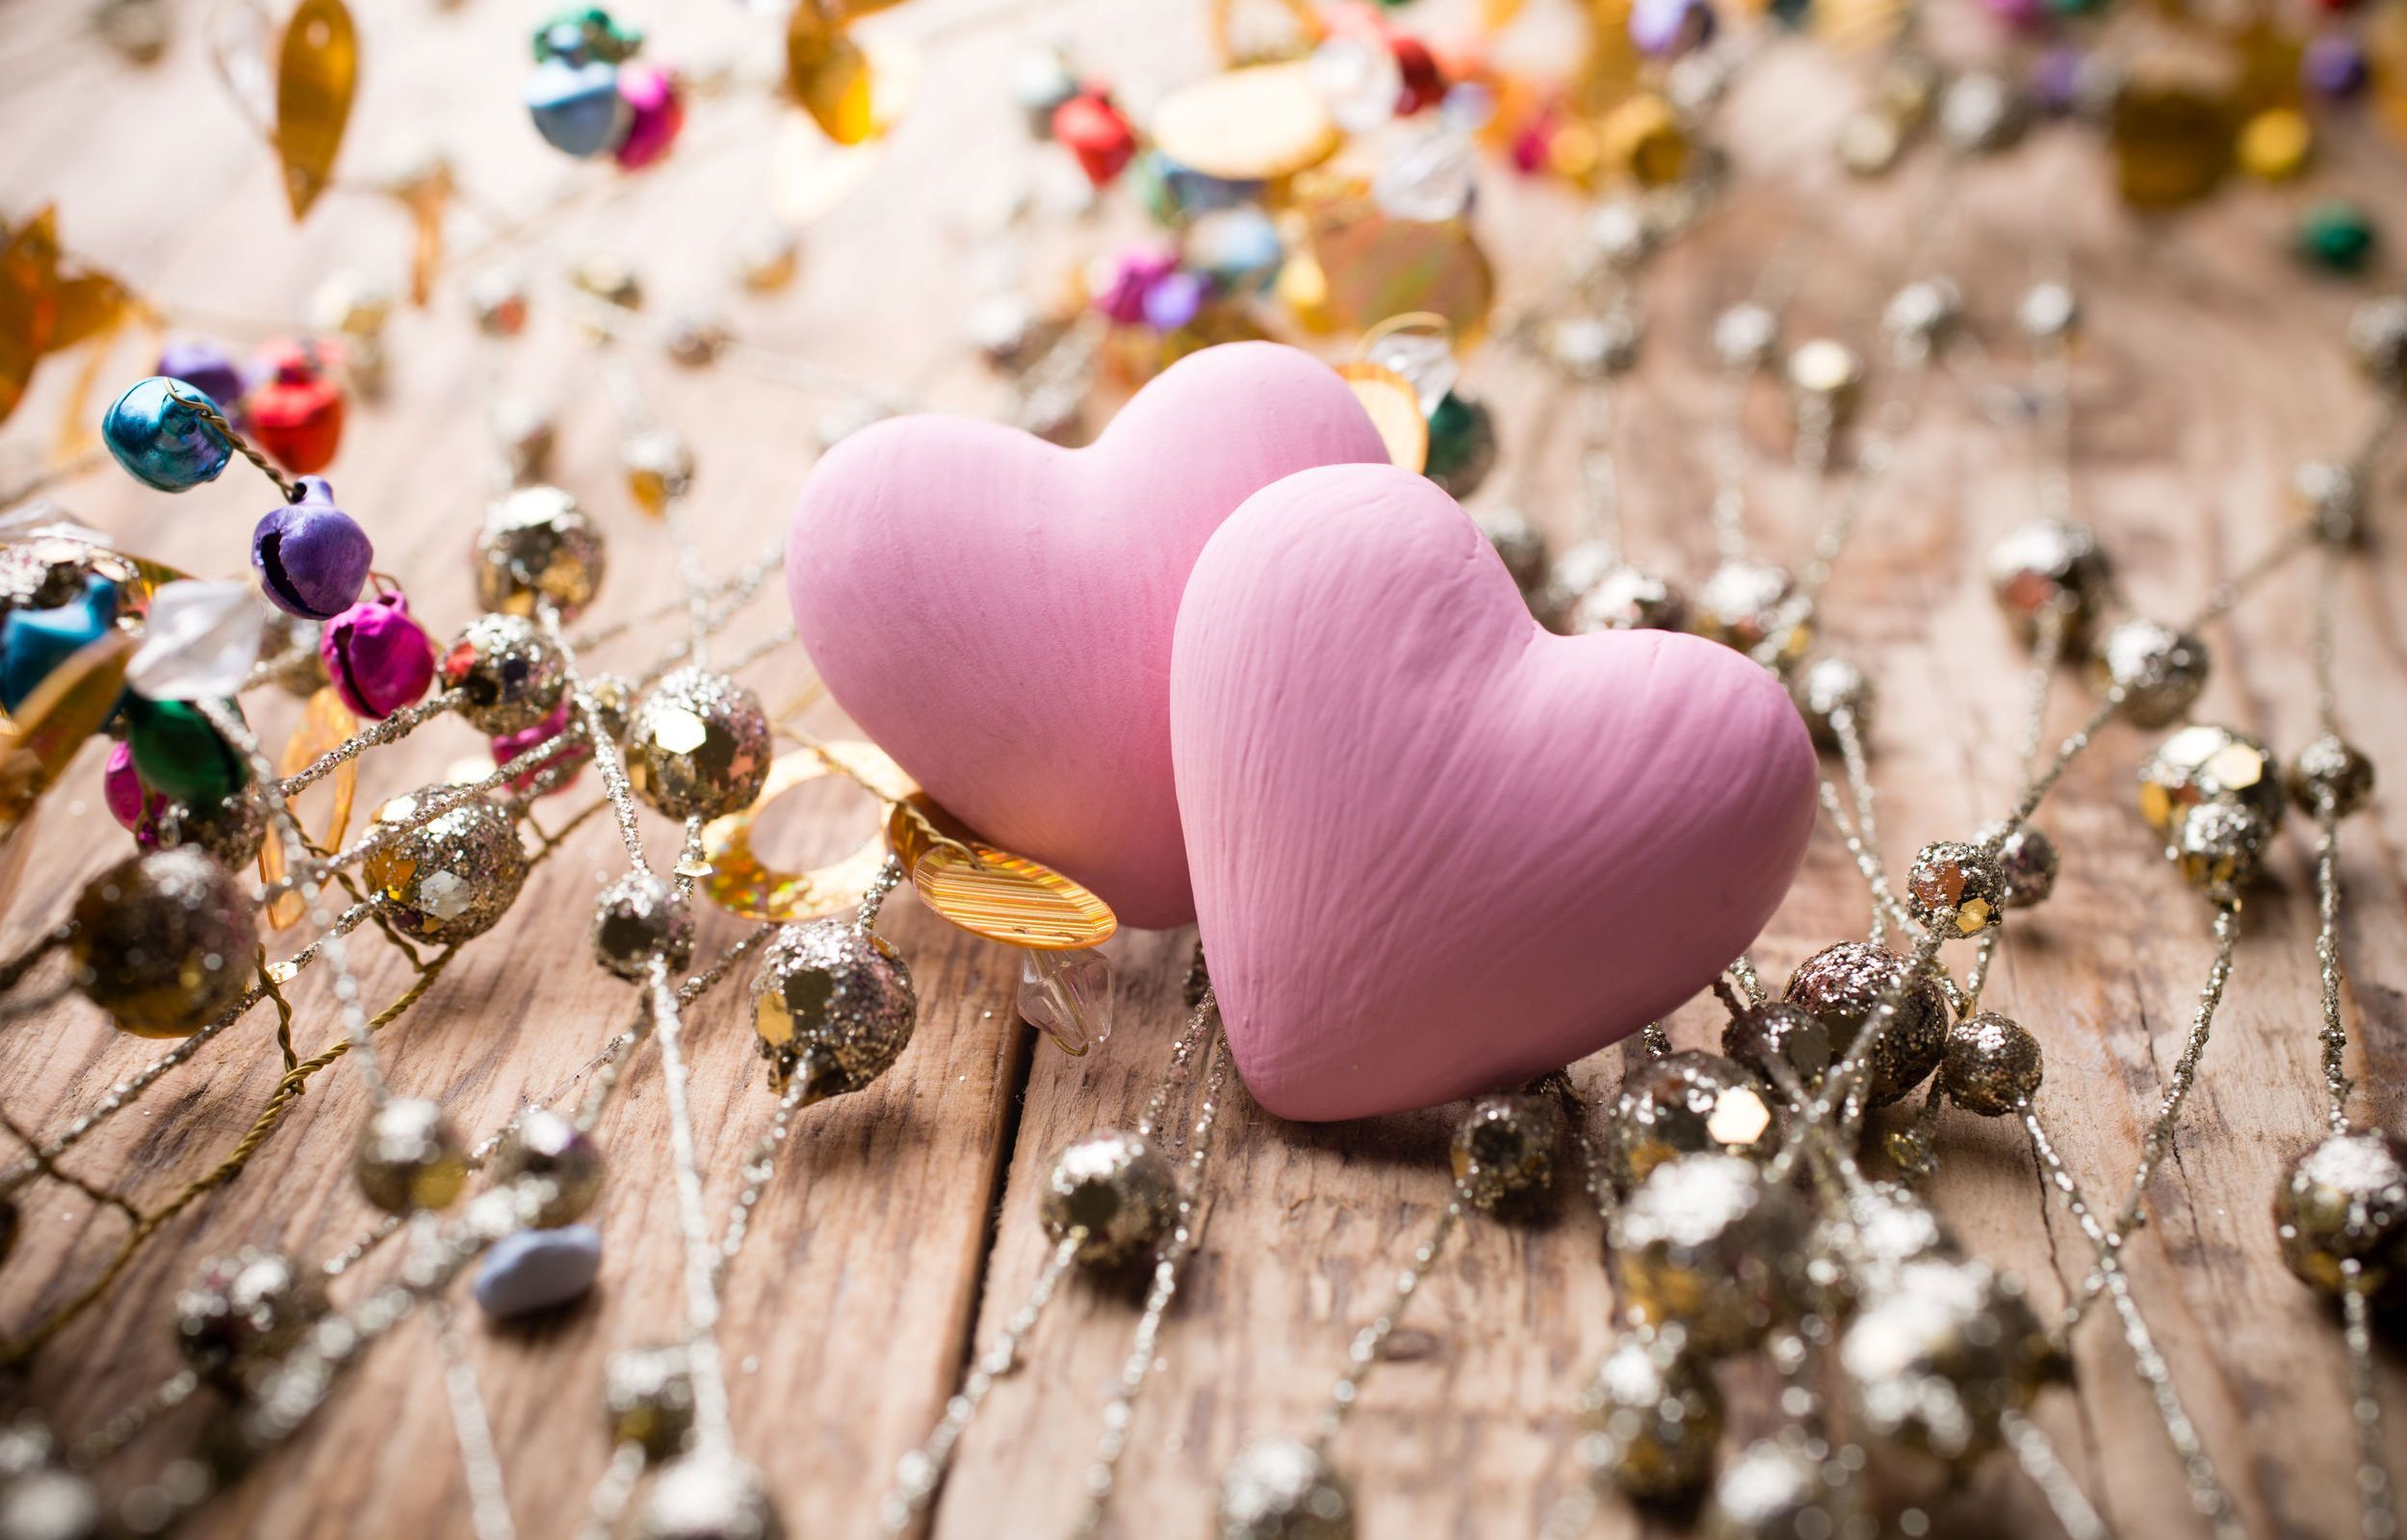 Сердце из камушка  № 1609204 без смс